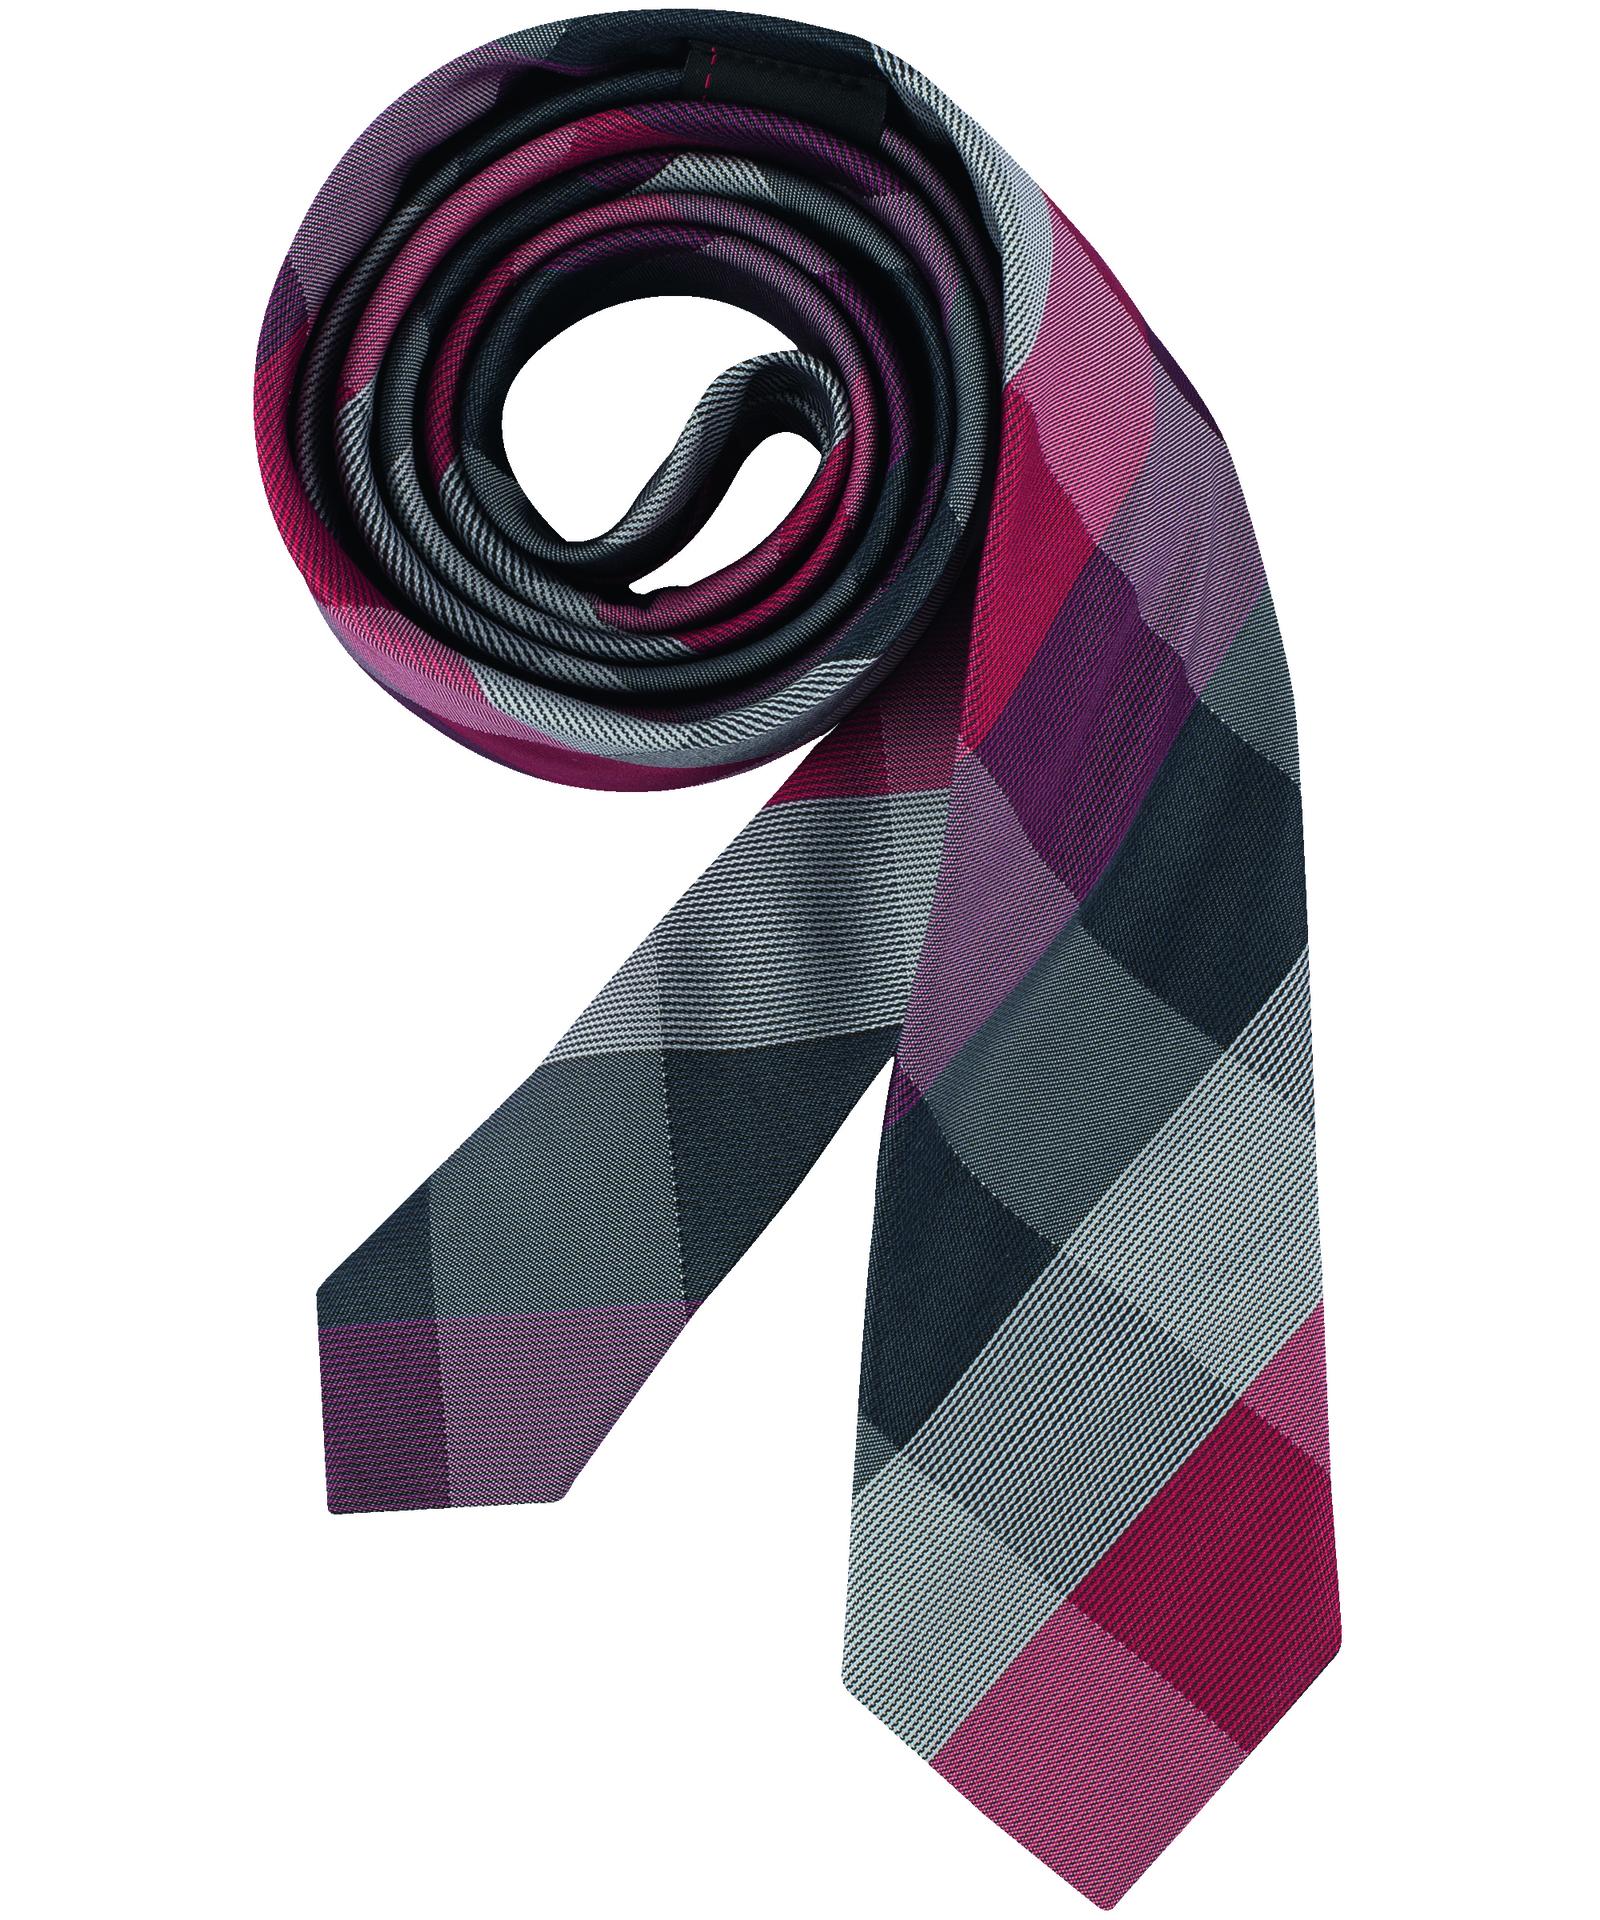 6918 9700 Krawatte Slimline